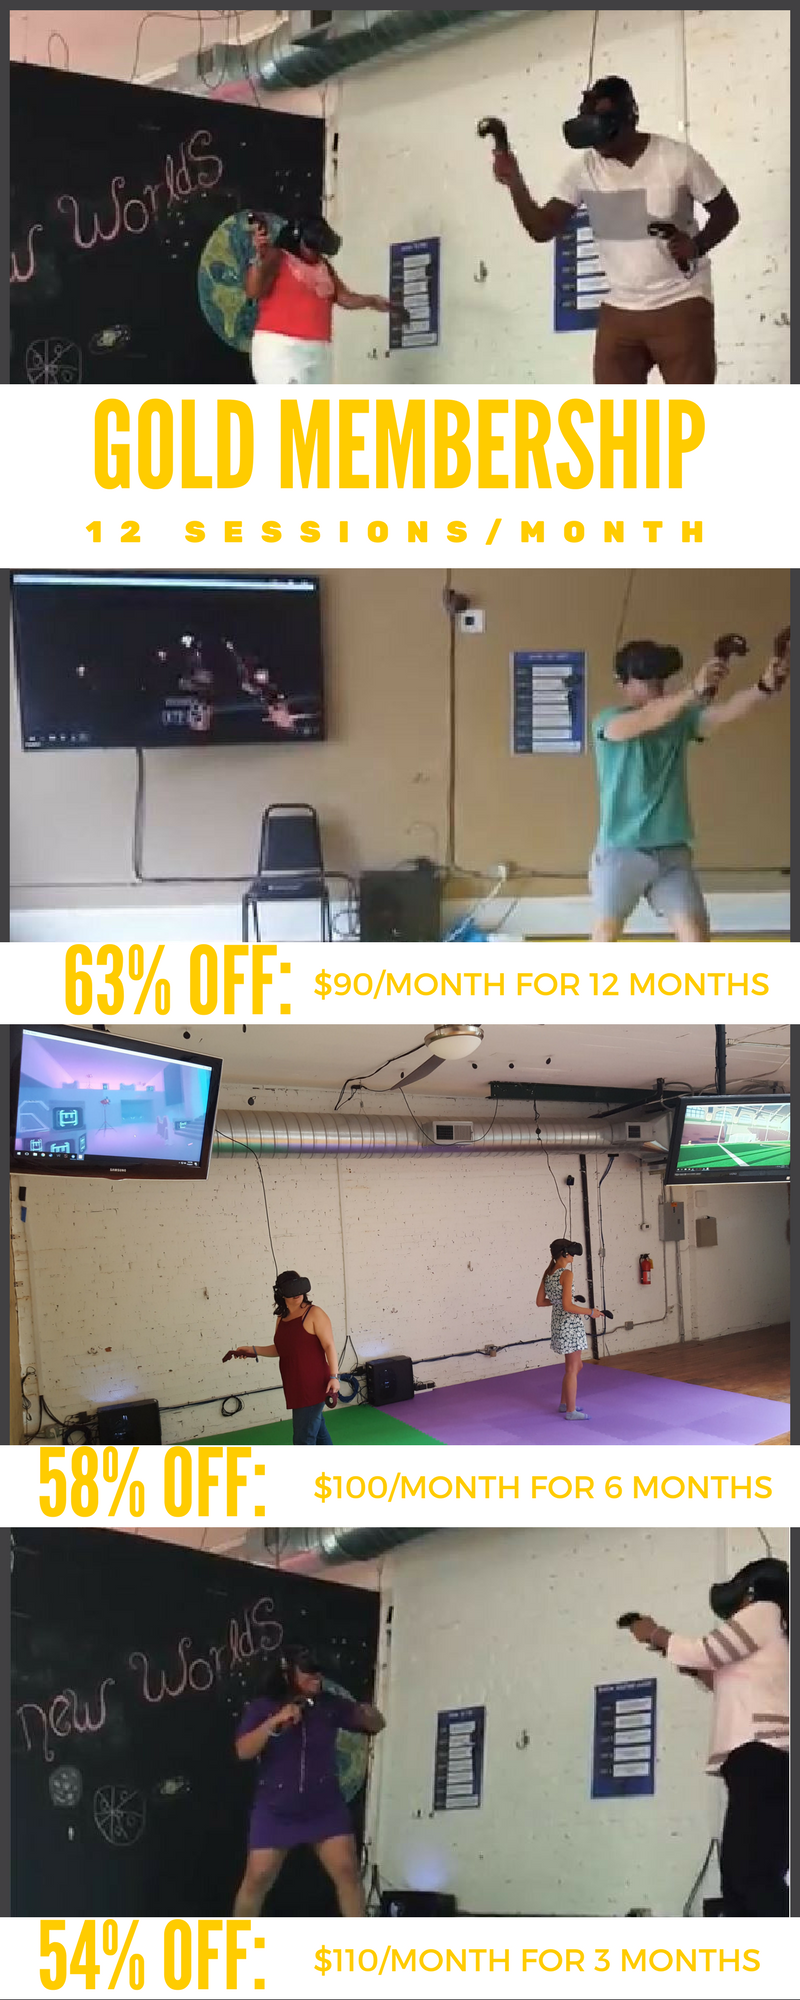 VR Arcade Gold Membership